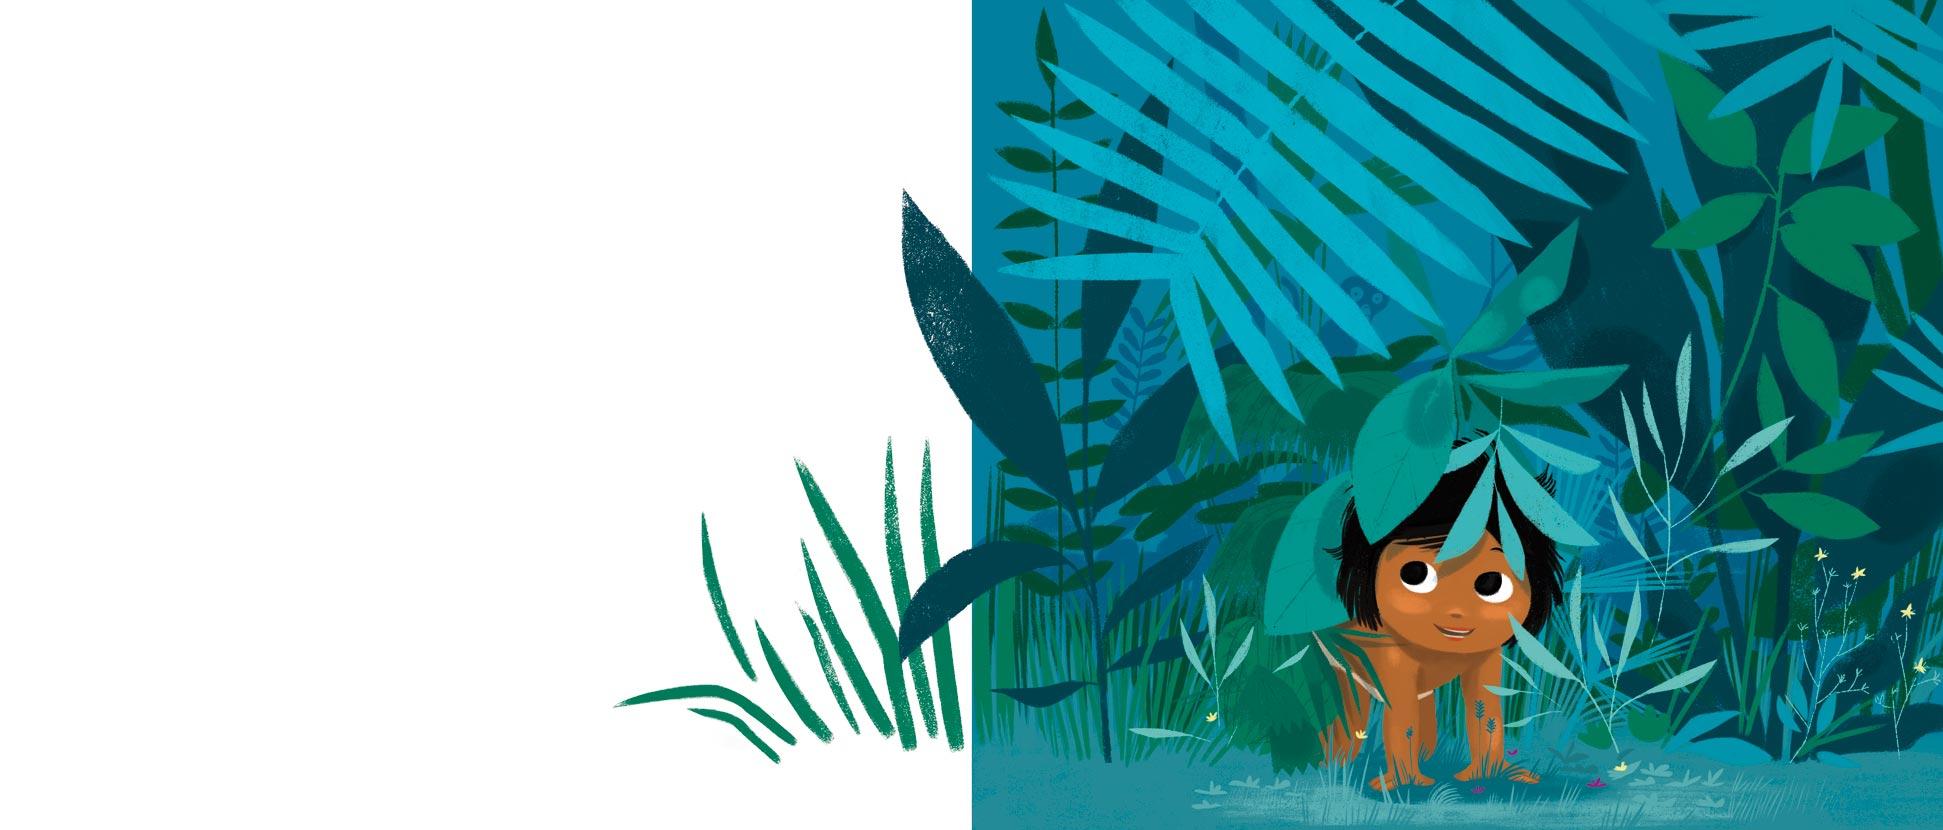 sebastien pelon mowgli flammarion pere castor